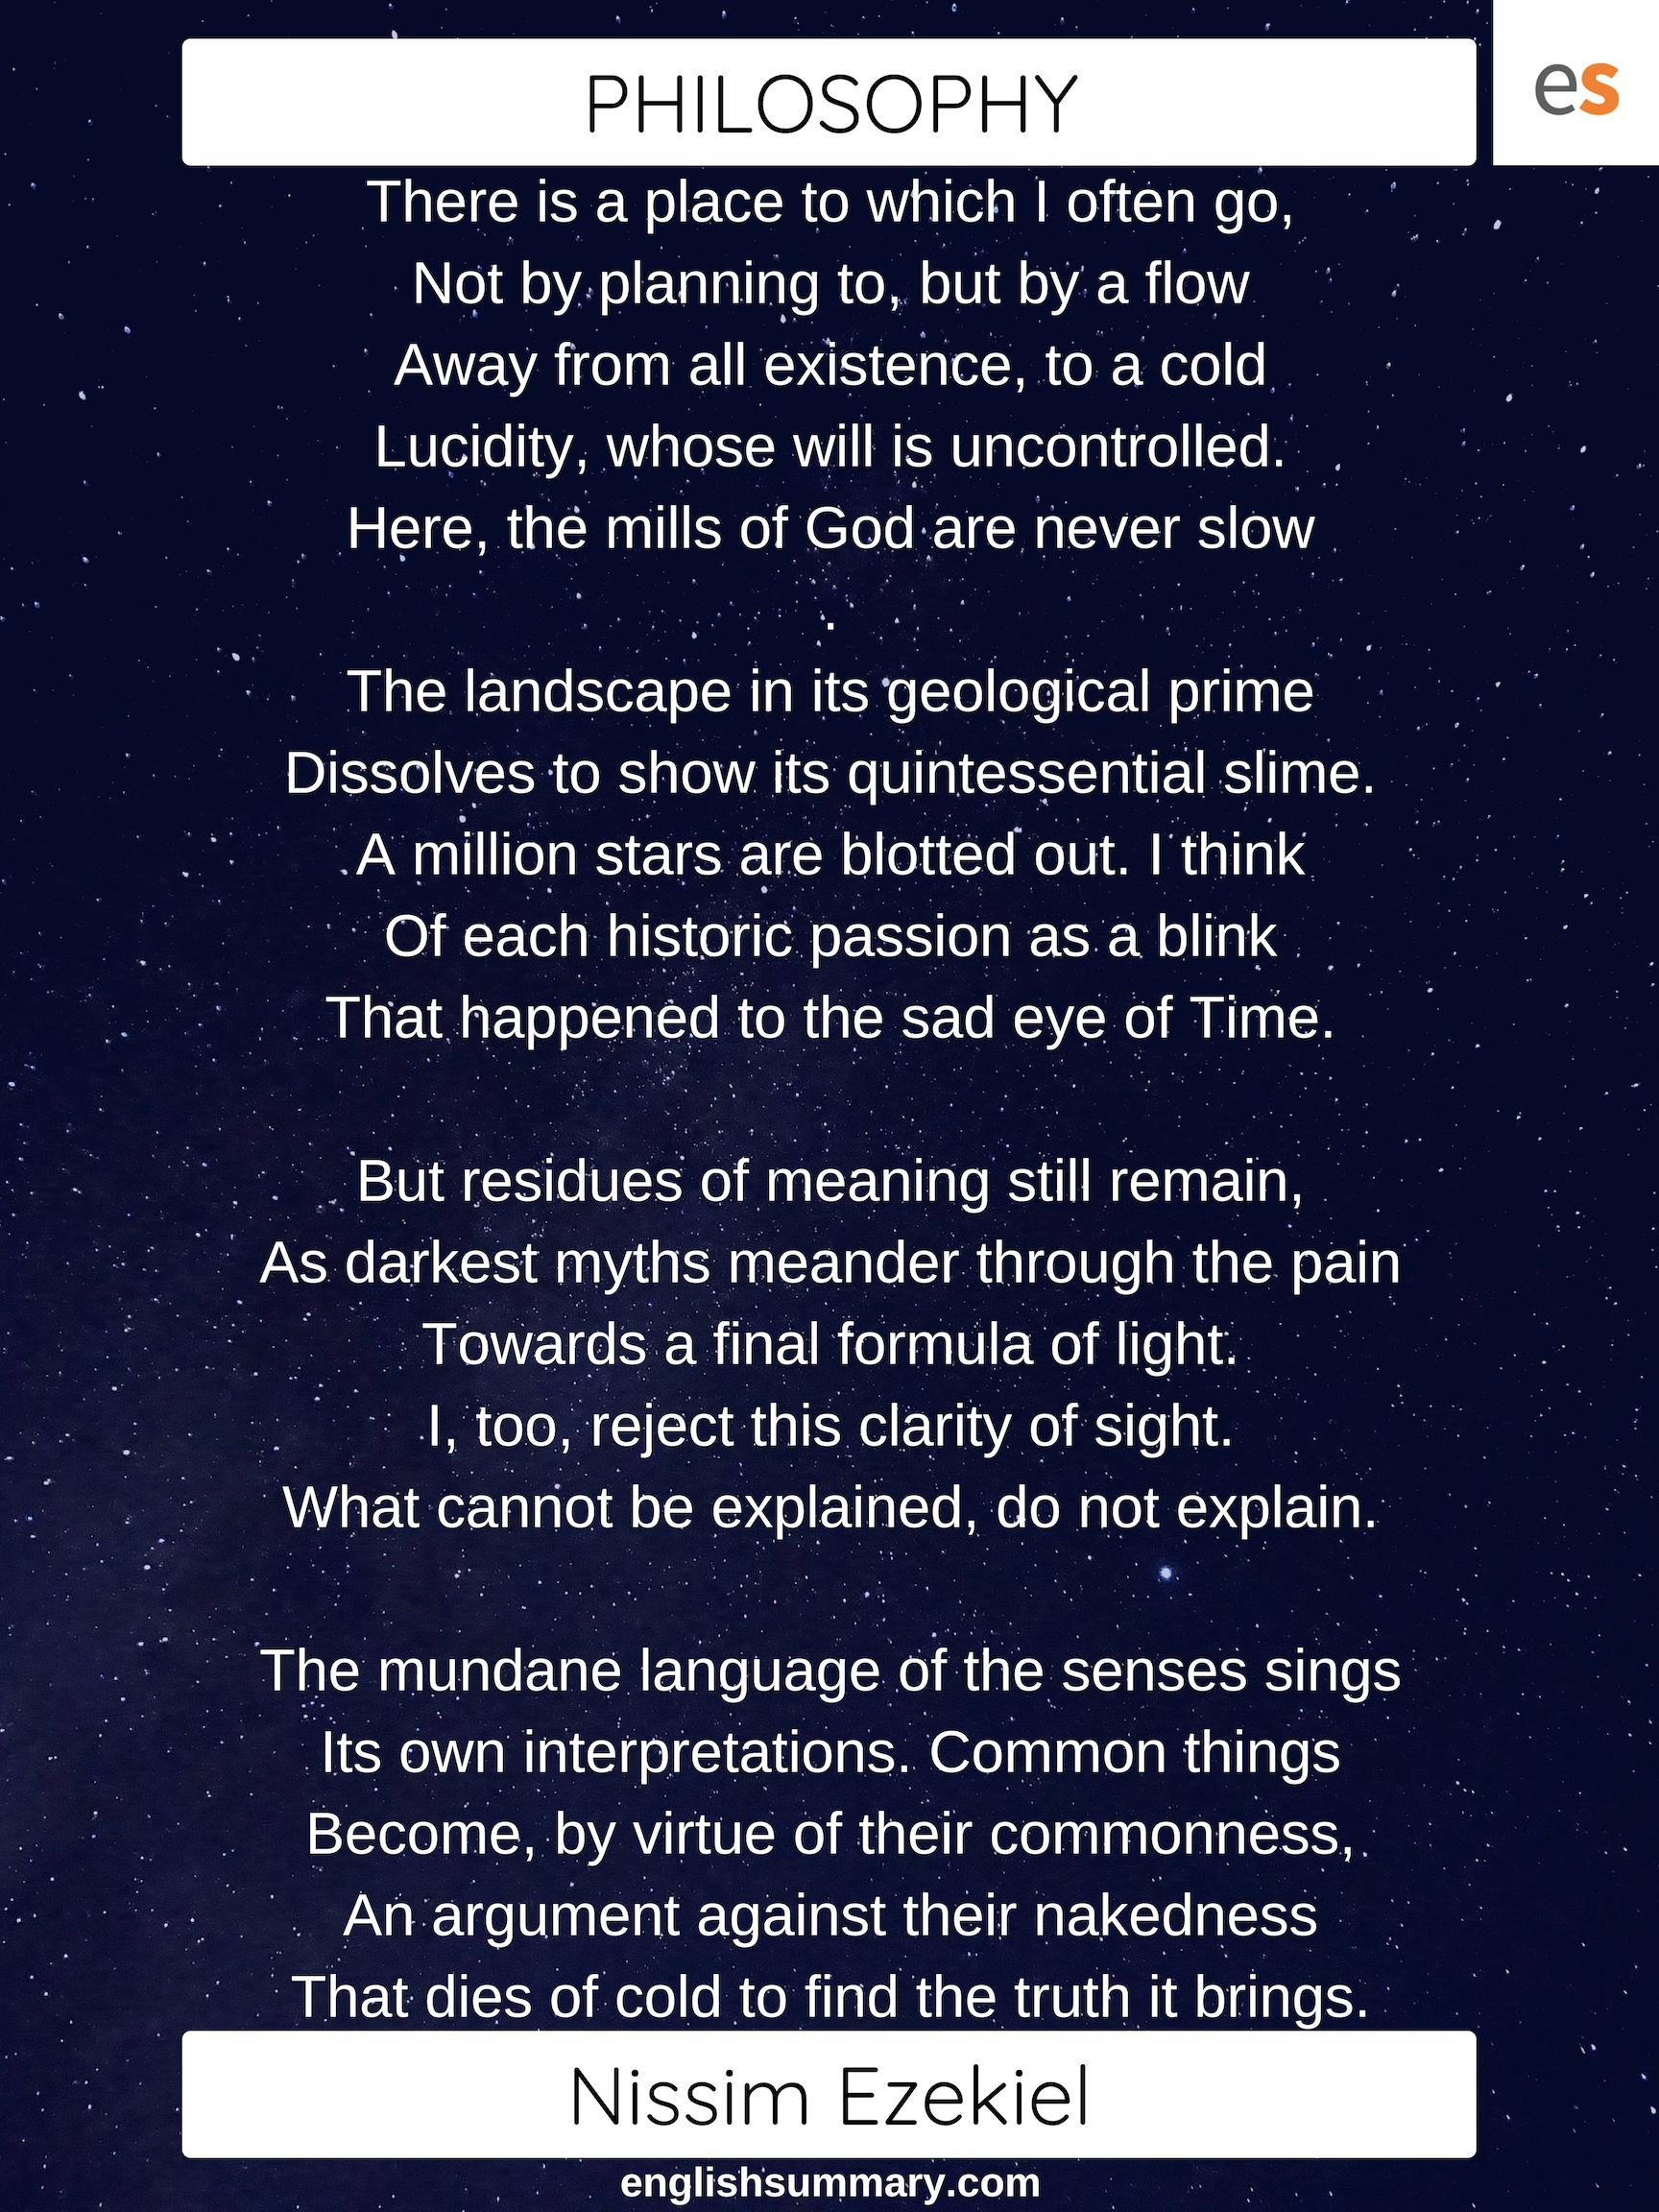 Philosophy Poem By Nissim Ezekiel English Vocabulary Word Morning Quotes A Thing Of Beauty John Keat Theme